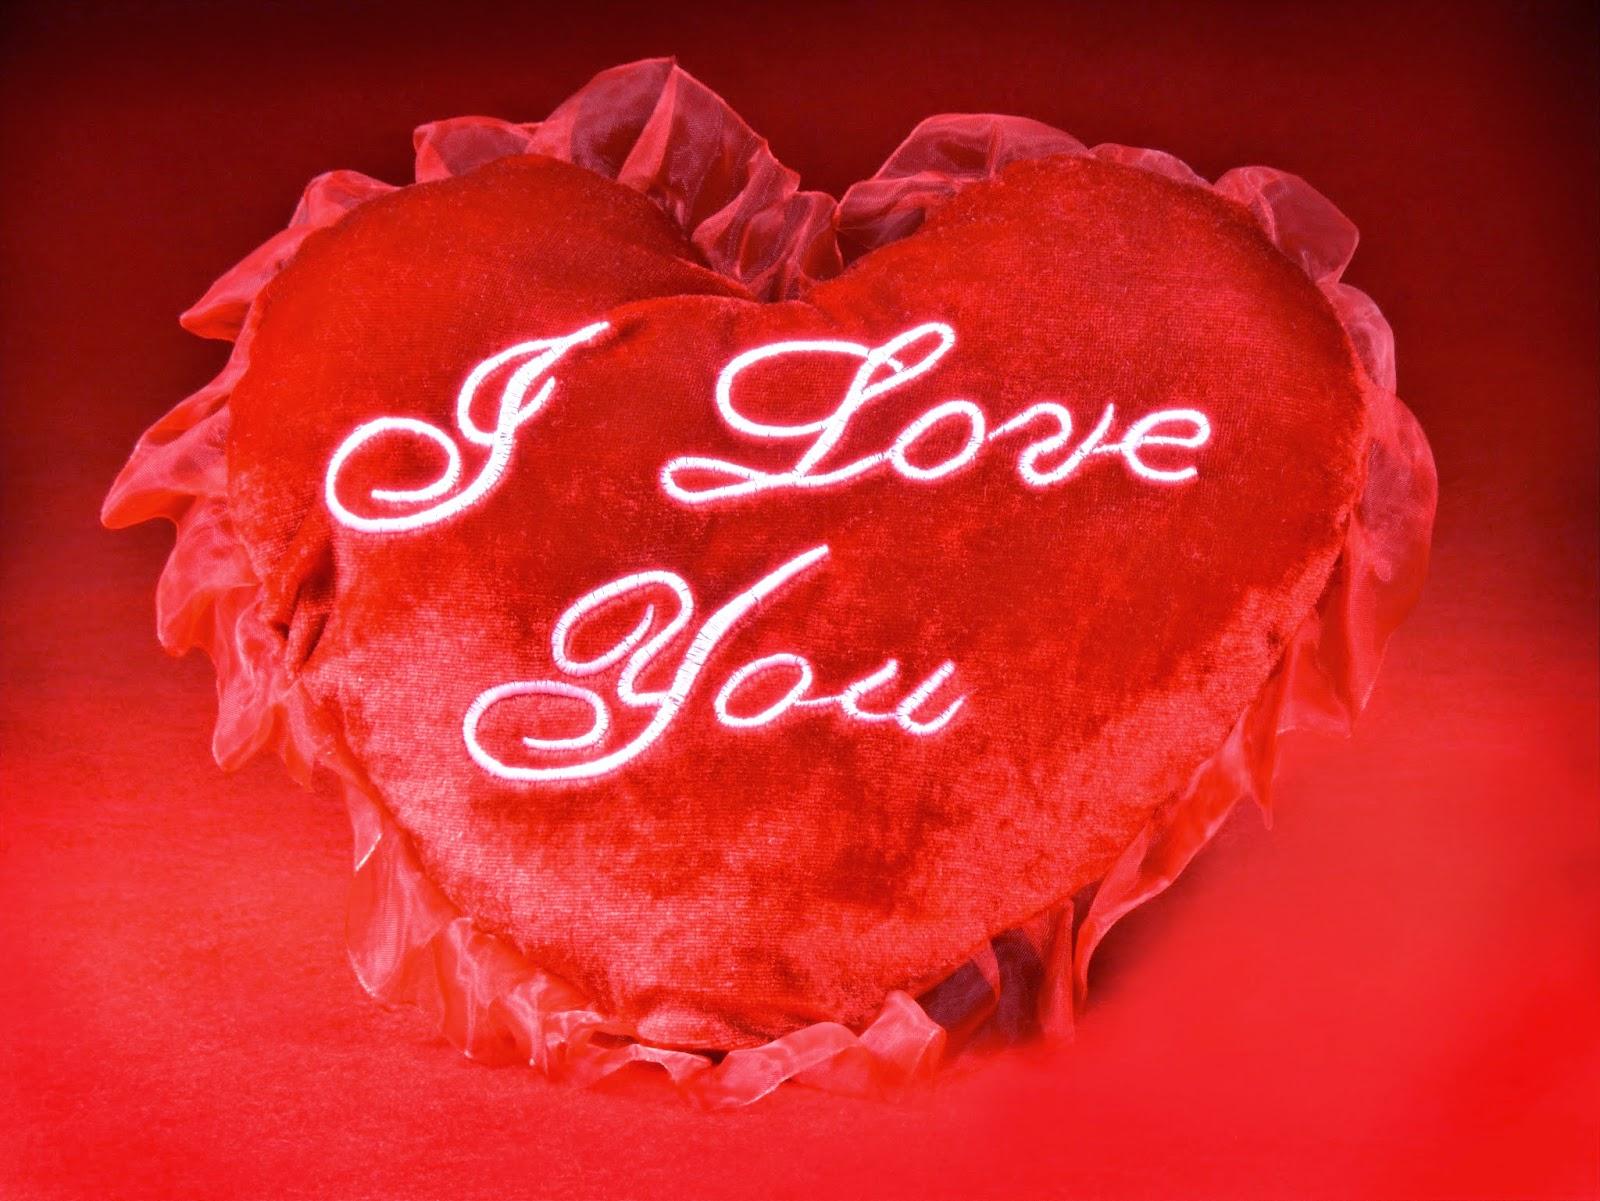 love you hd wallpaper - pic wallpaper hd